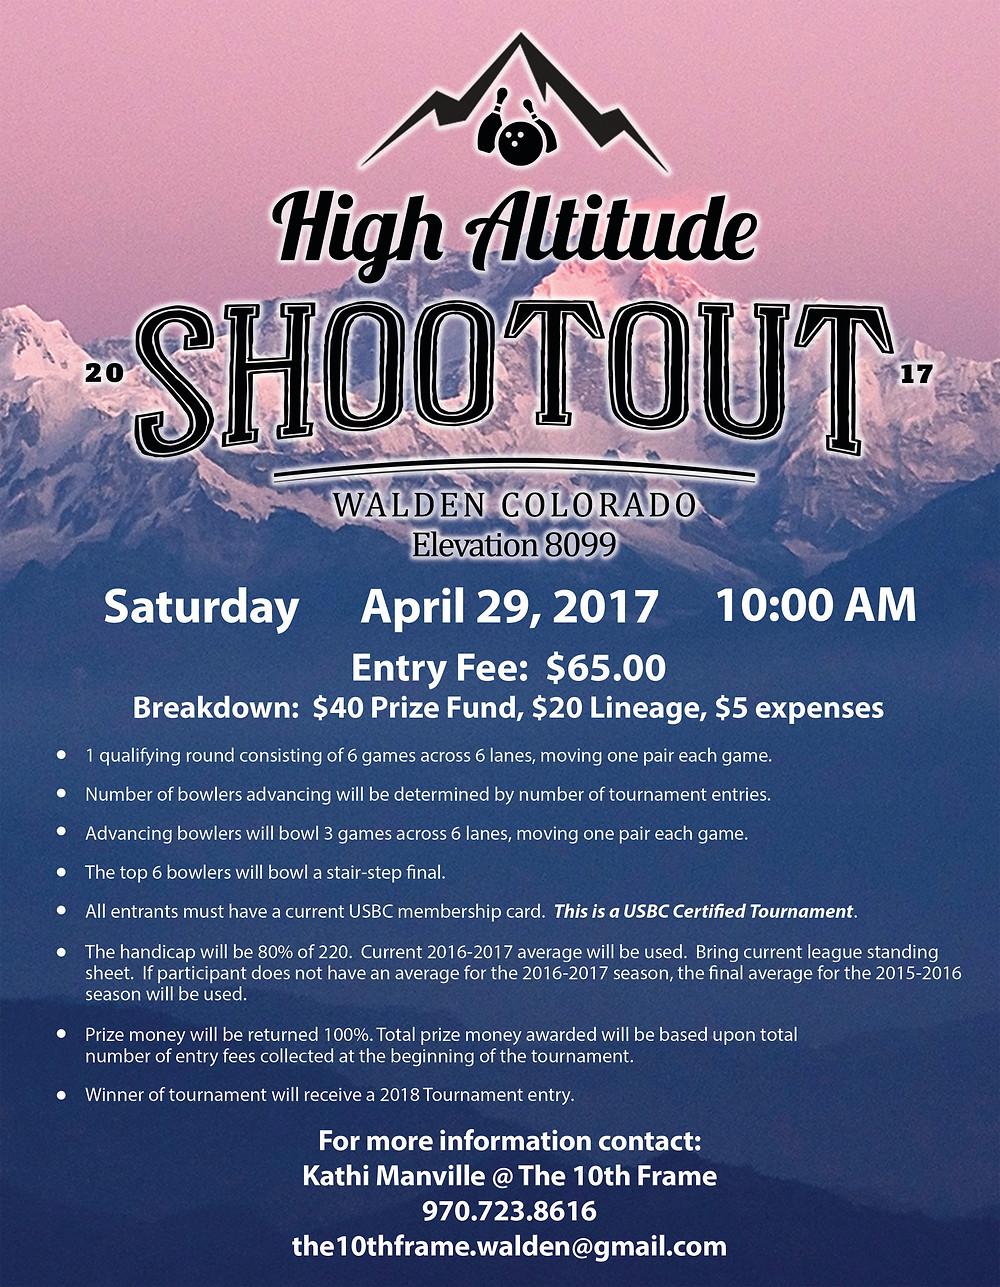 The 10th Frame High Altitude Shootout